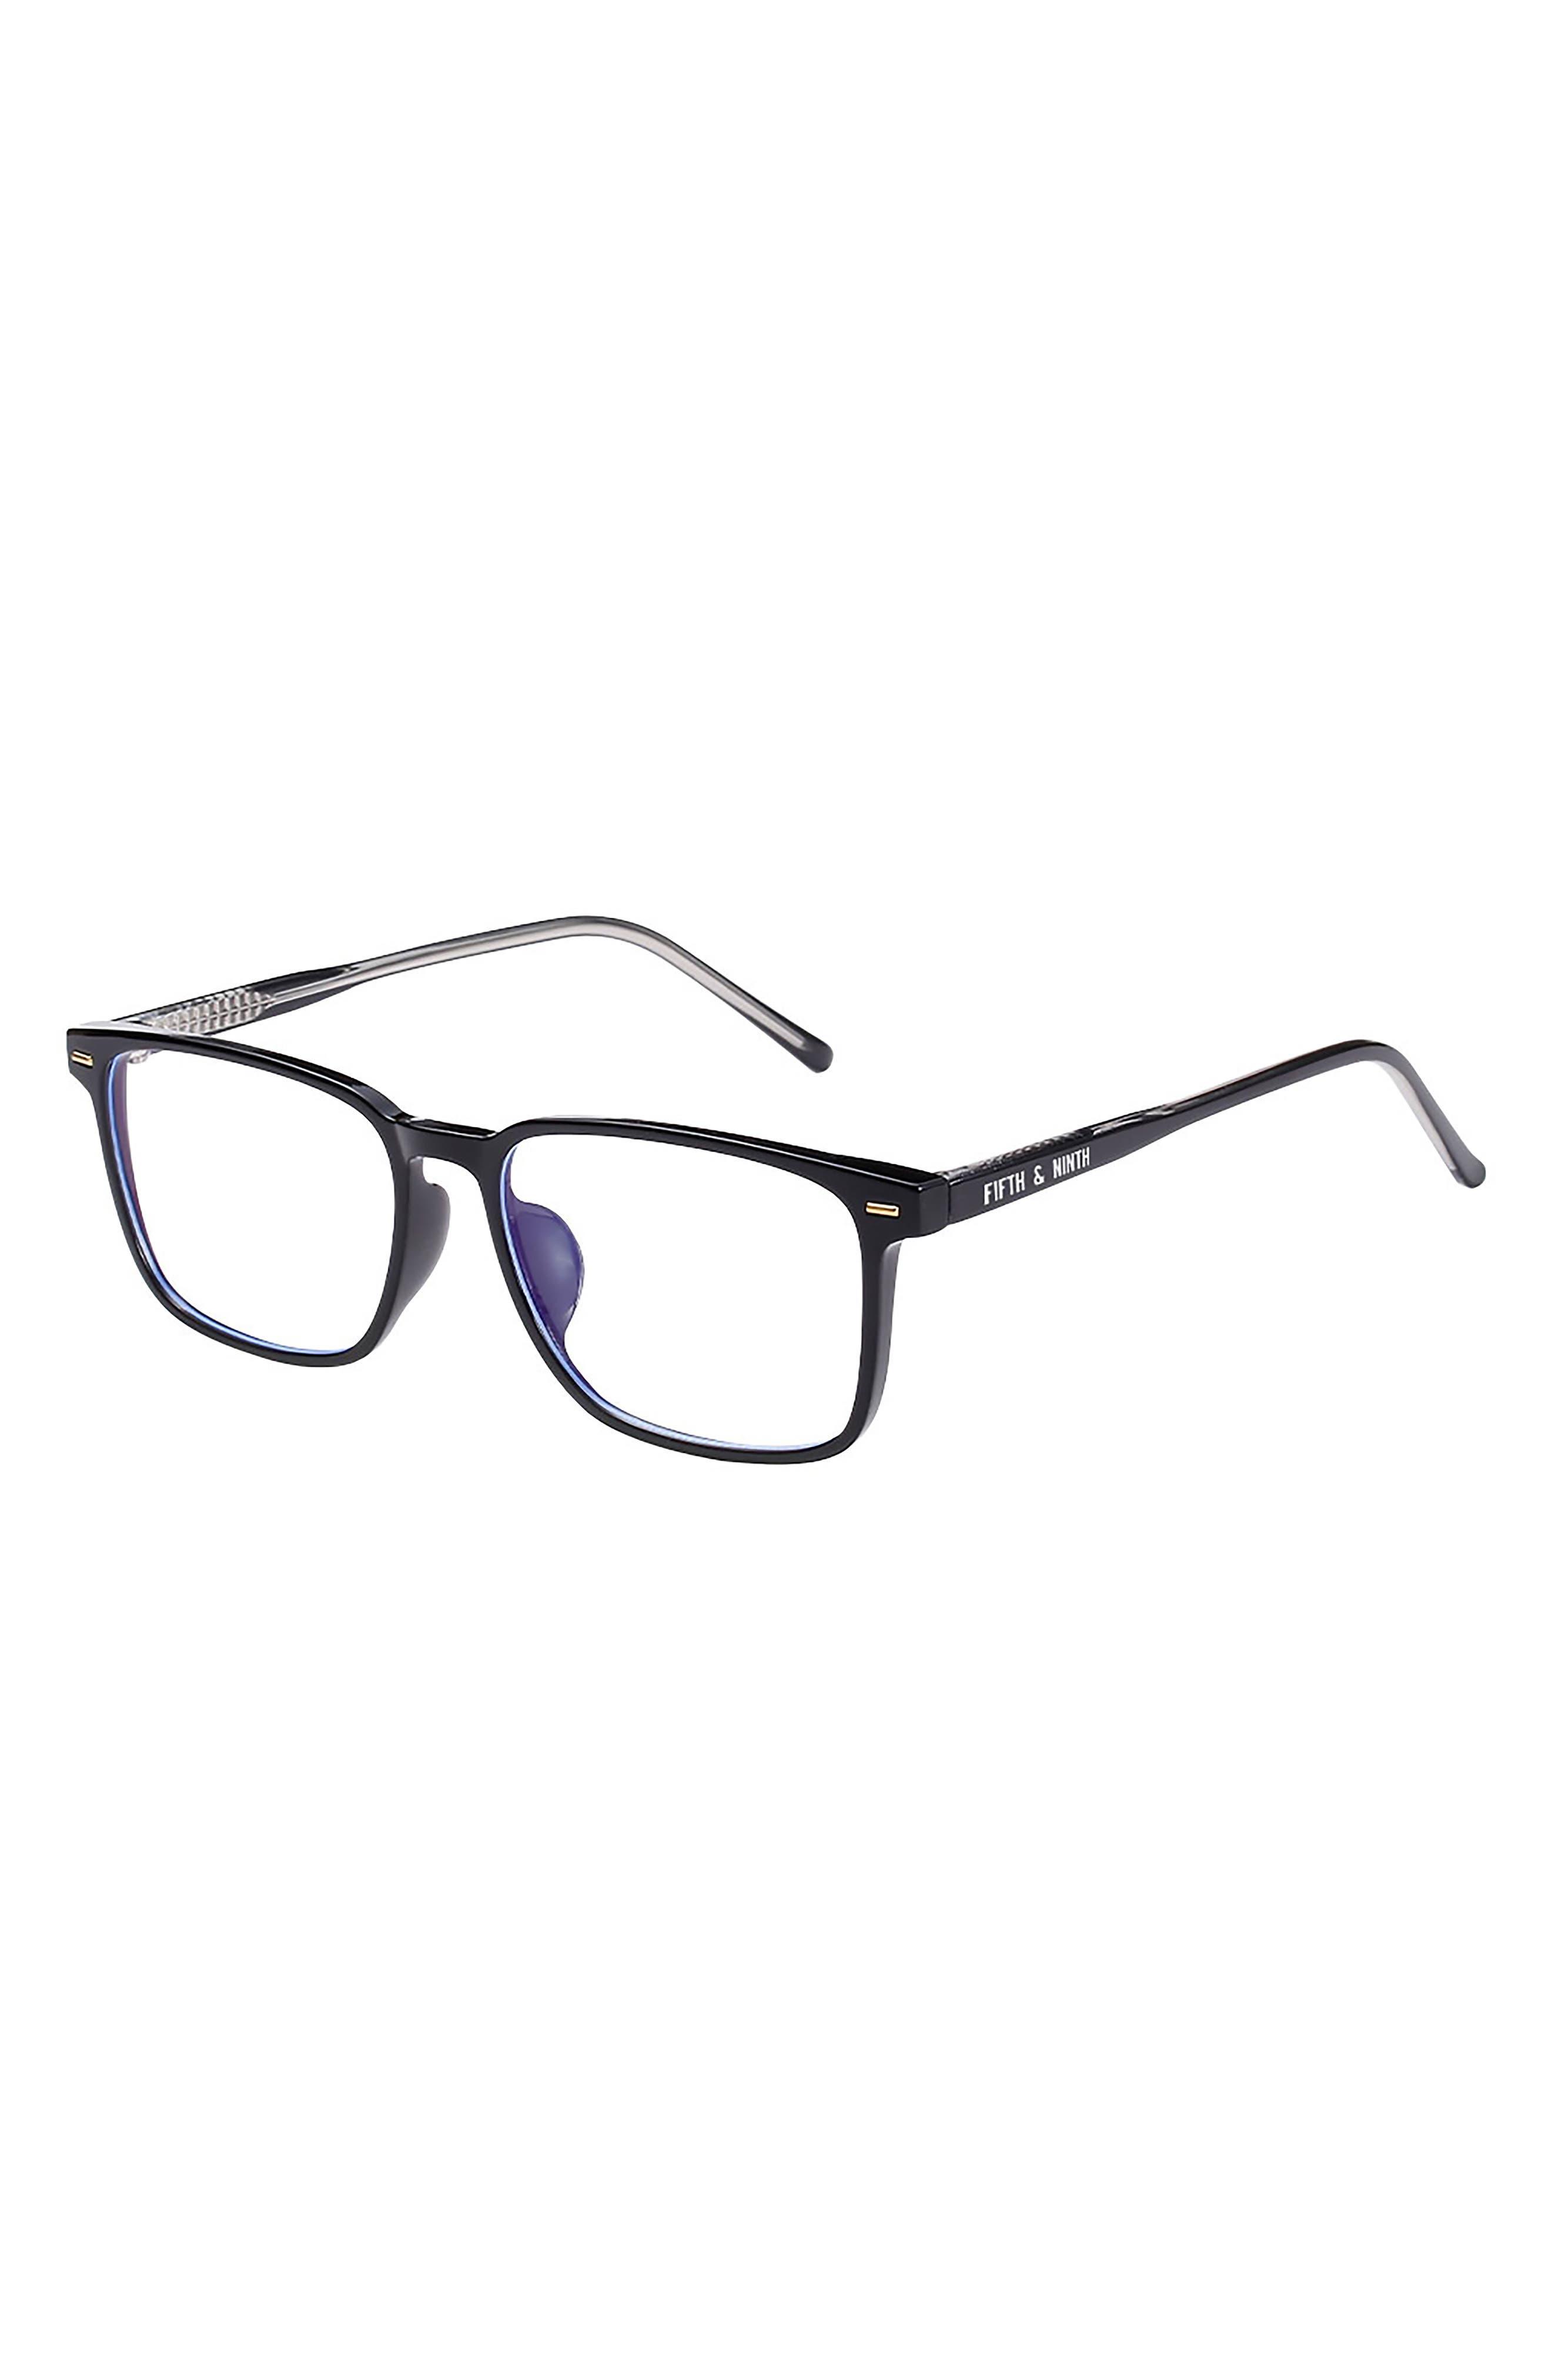 53mm Square Blue Light Blocking Glasses